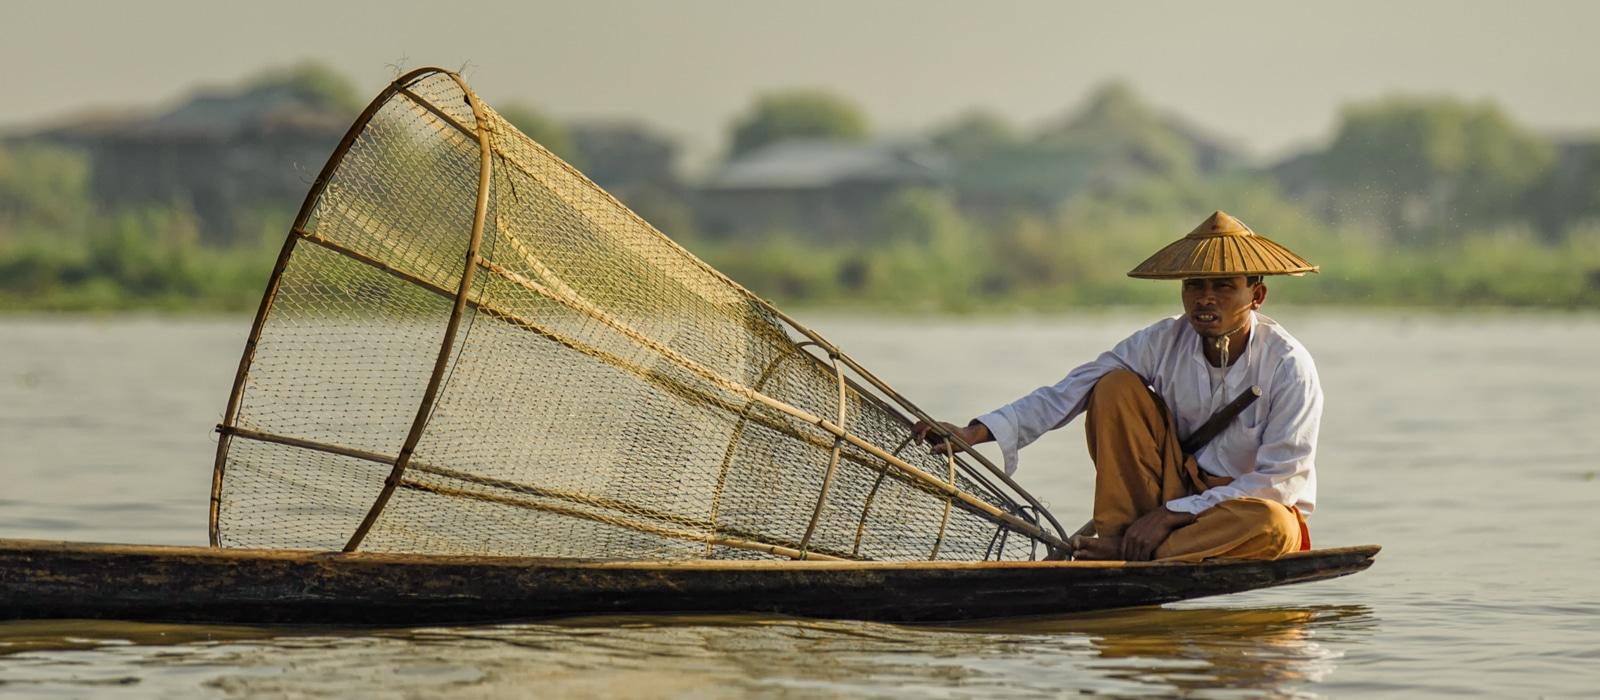 img-diapo-entete - Myanmar-1600x700-6.jpg